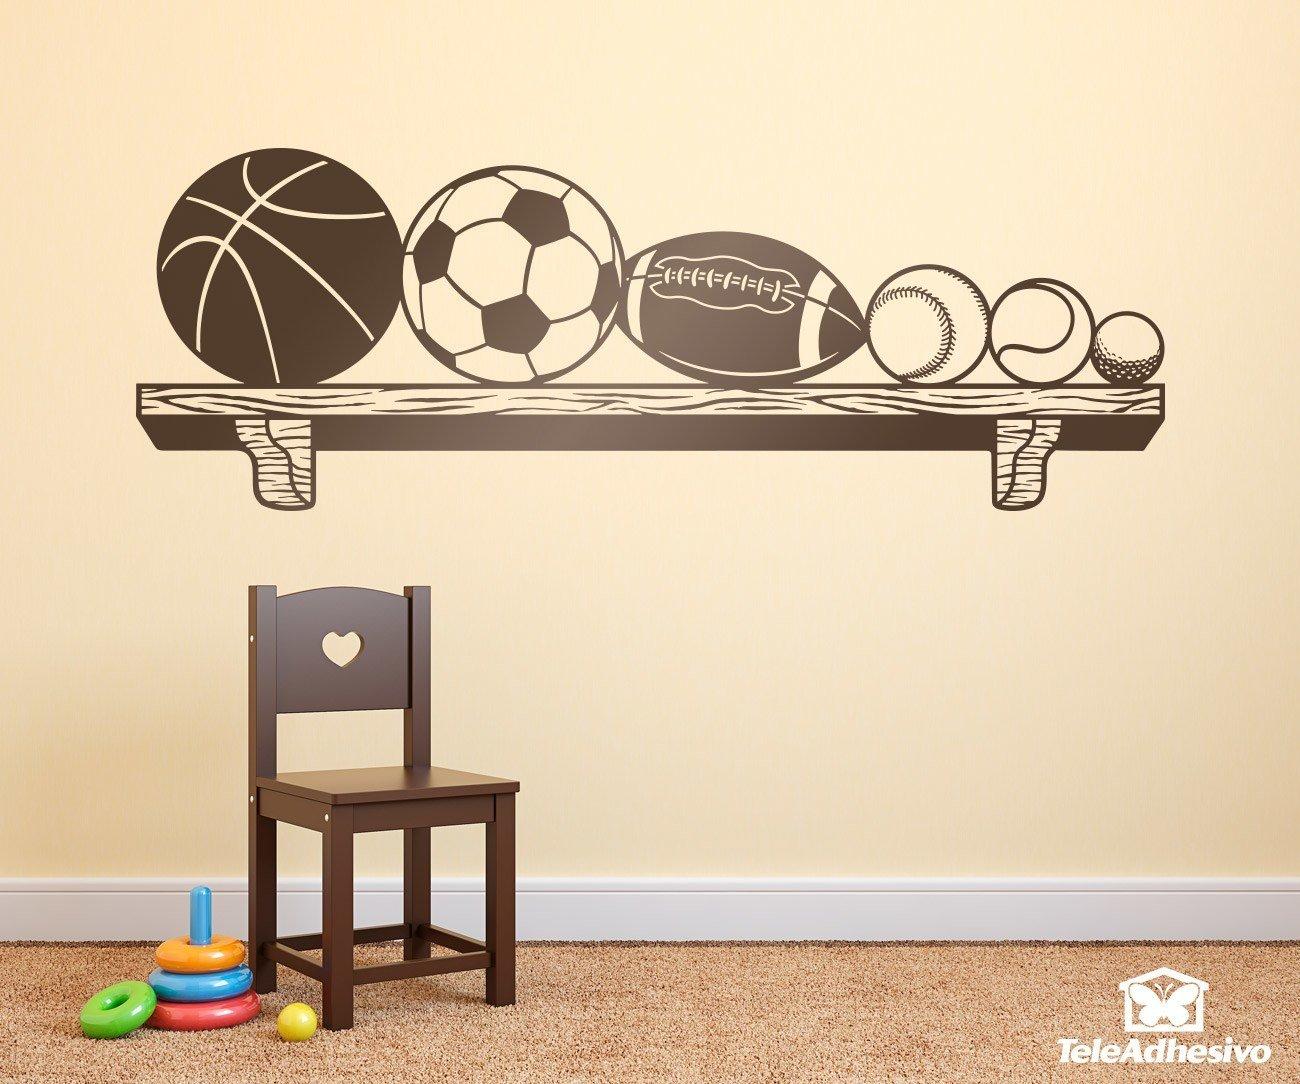 Vinilo decorativo de estante con pelotas o balones de for Vinilos para pared ninos